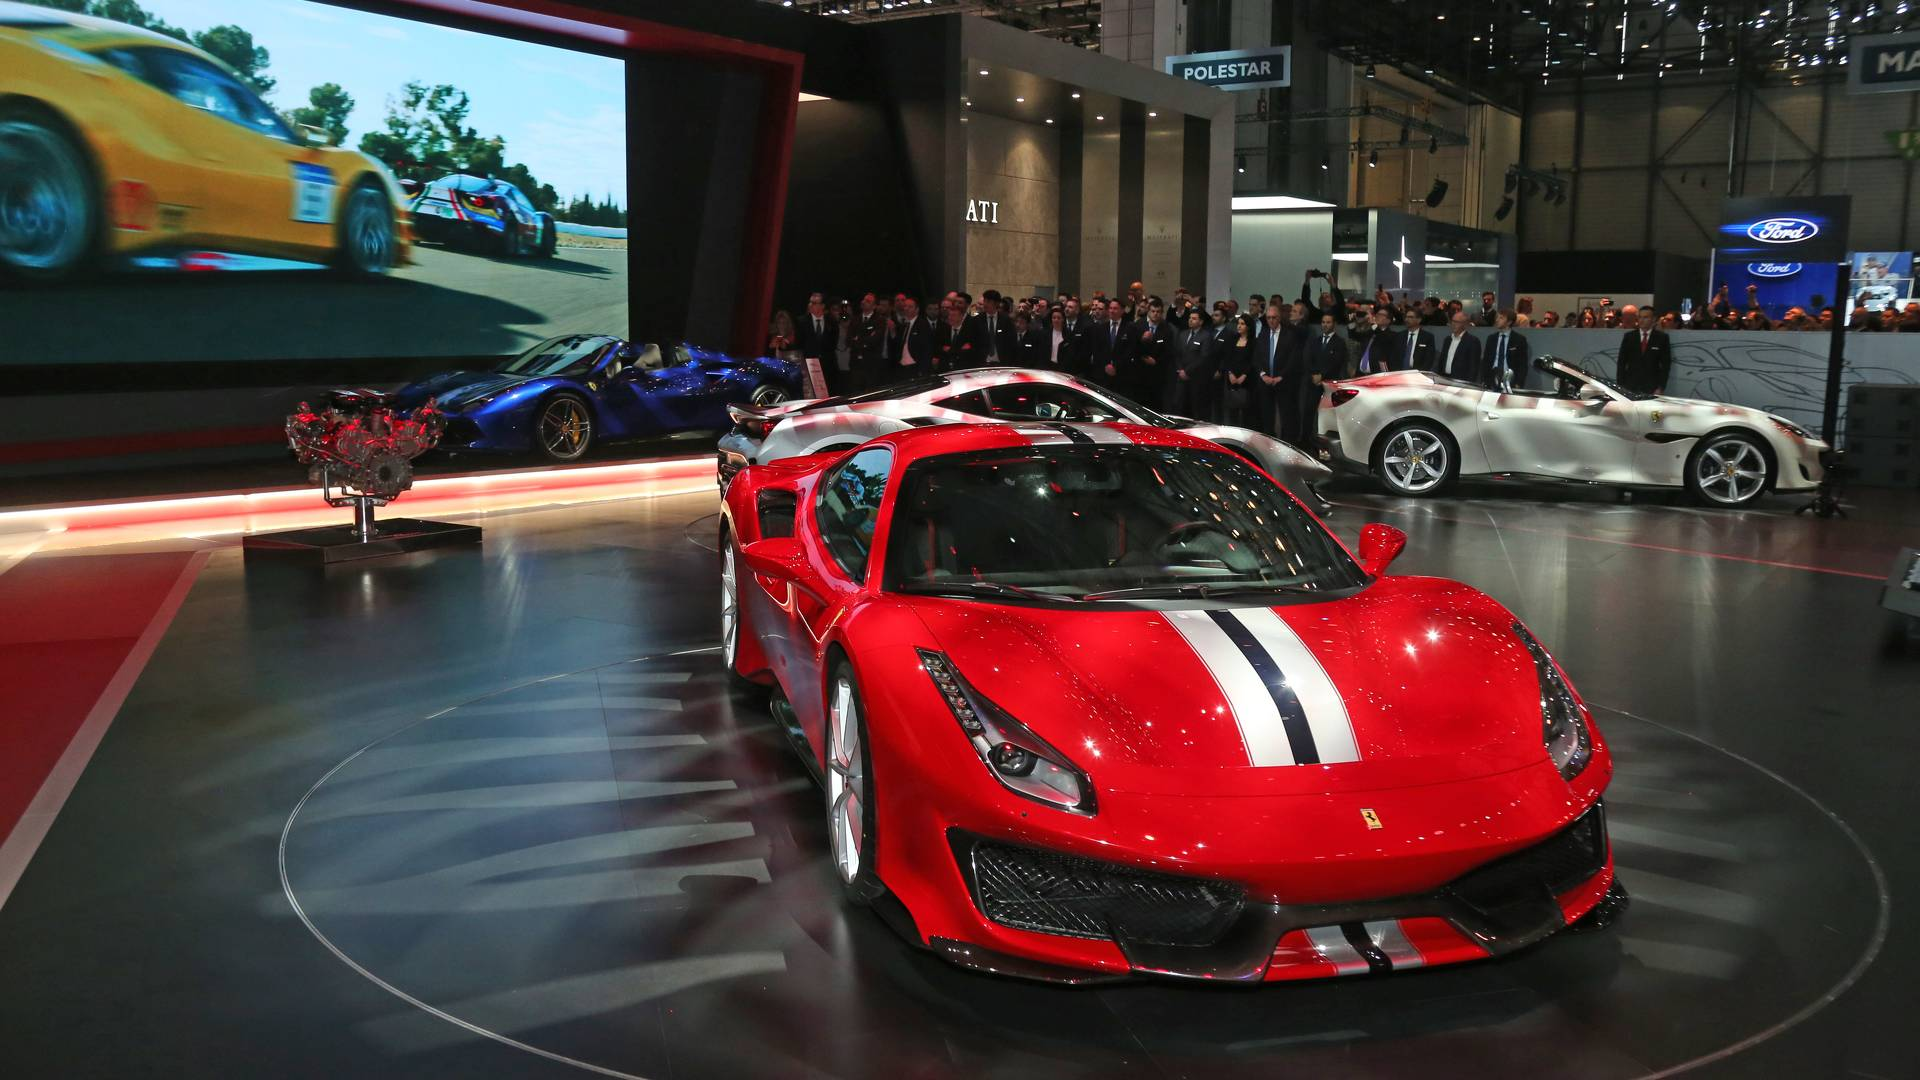 Ferrari 488 Pista Caught On Video In The Real World